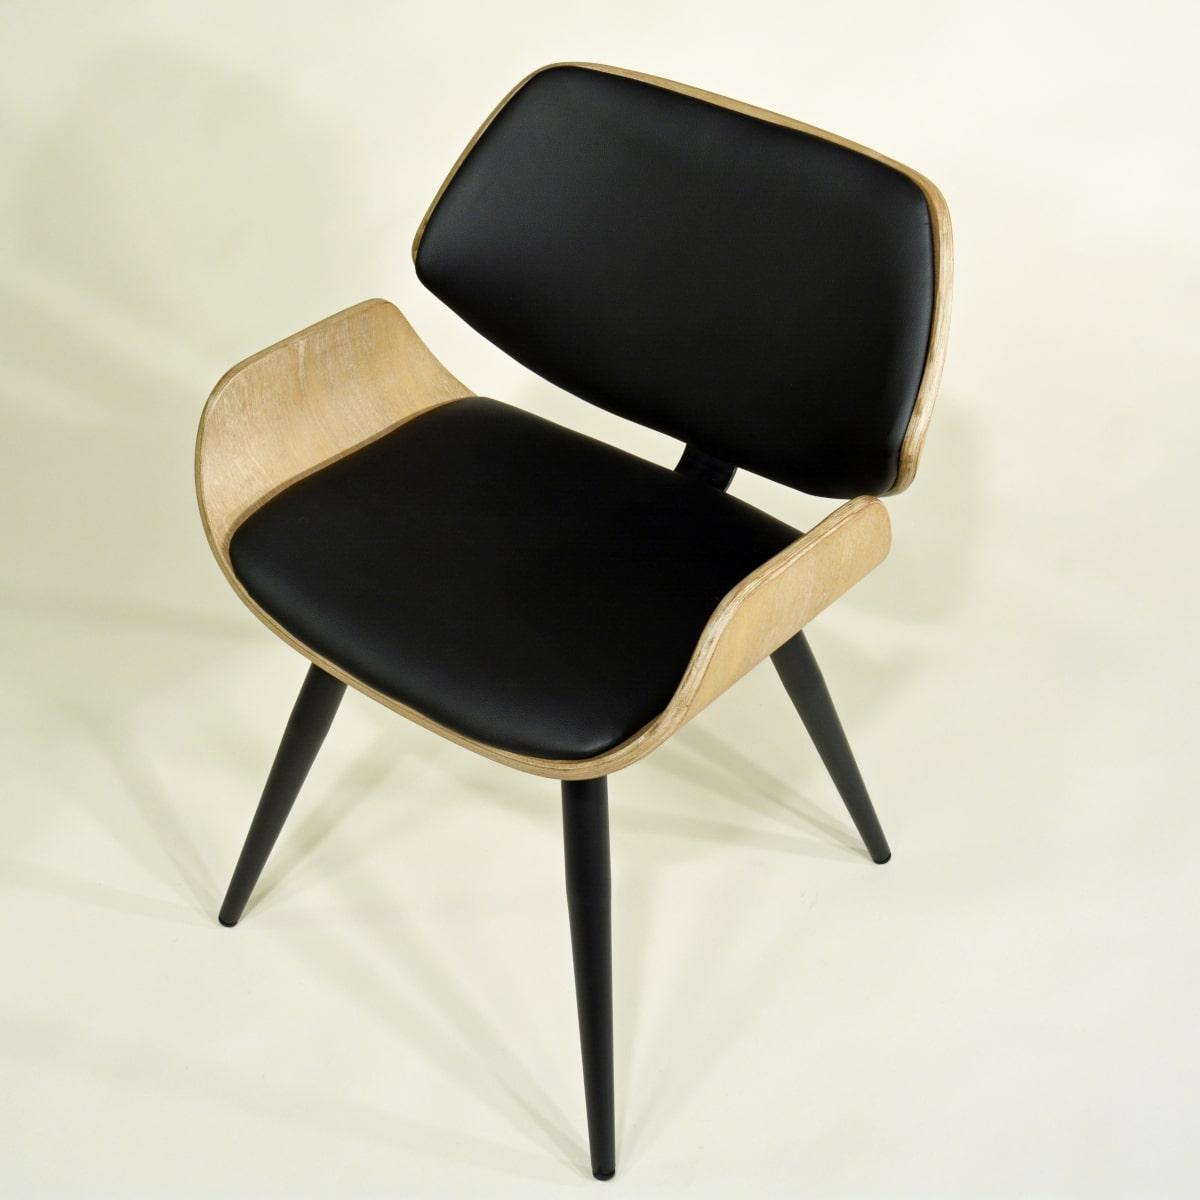 Holzstuhl Modern Retro Design